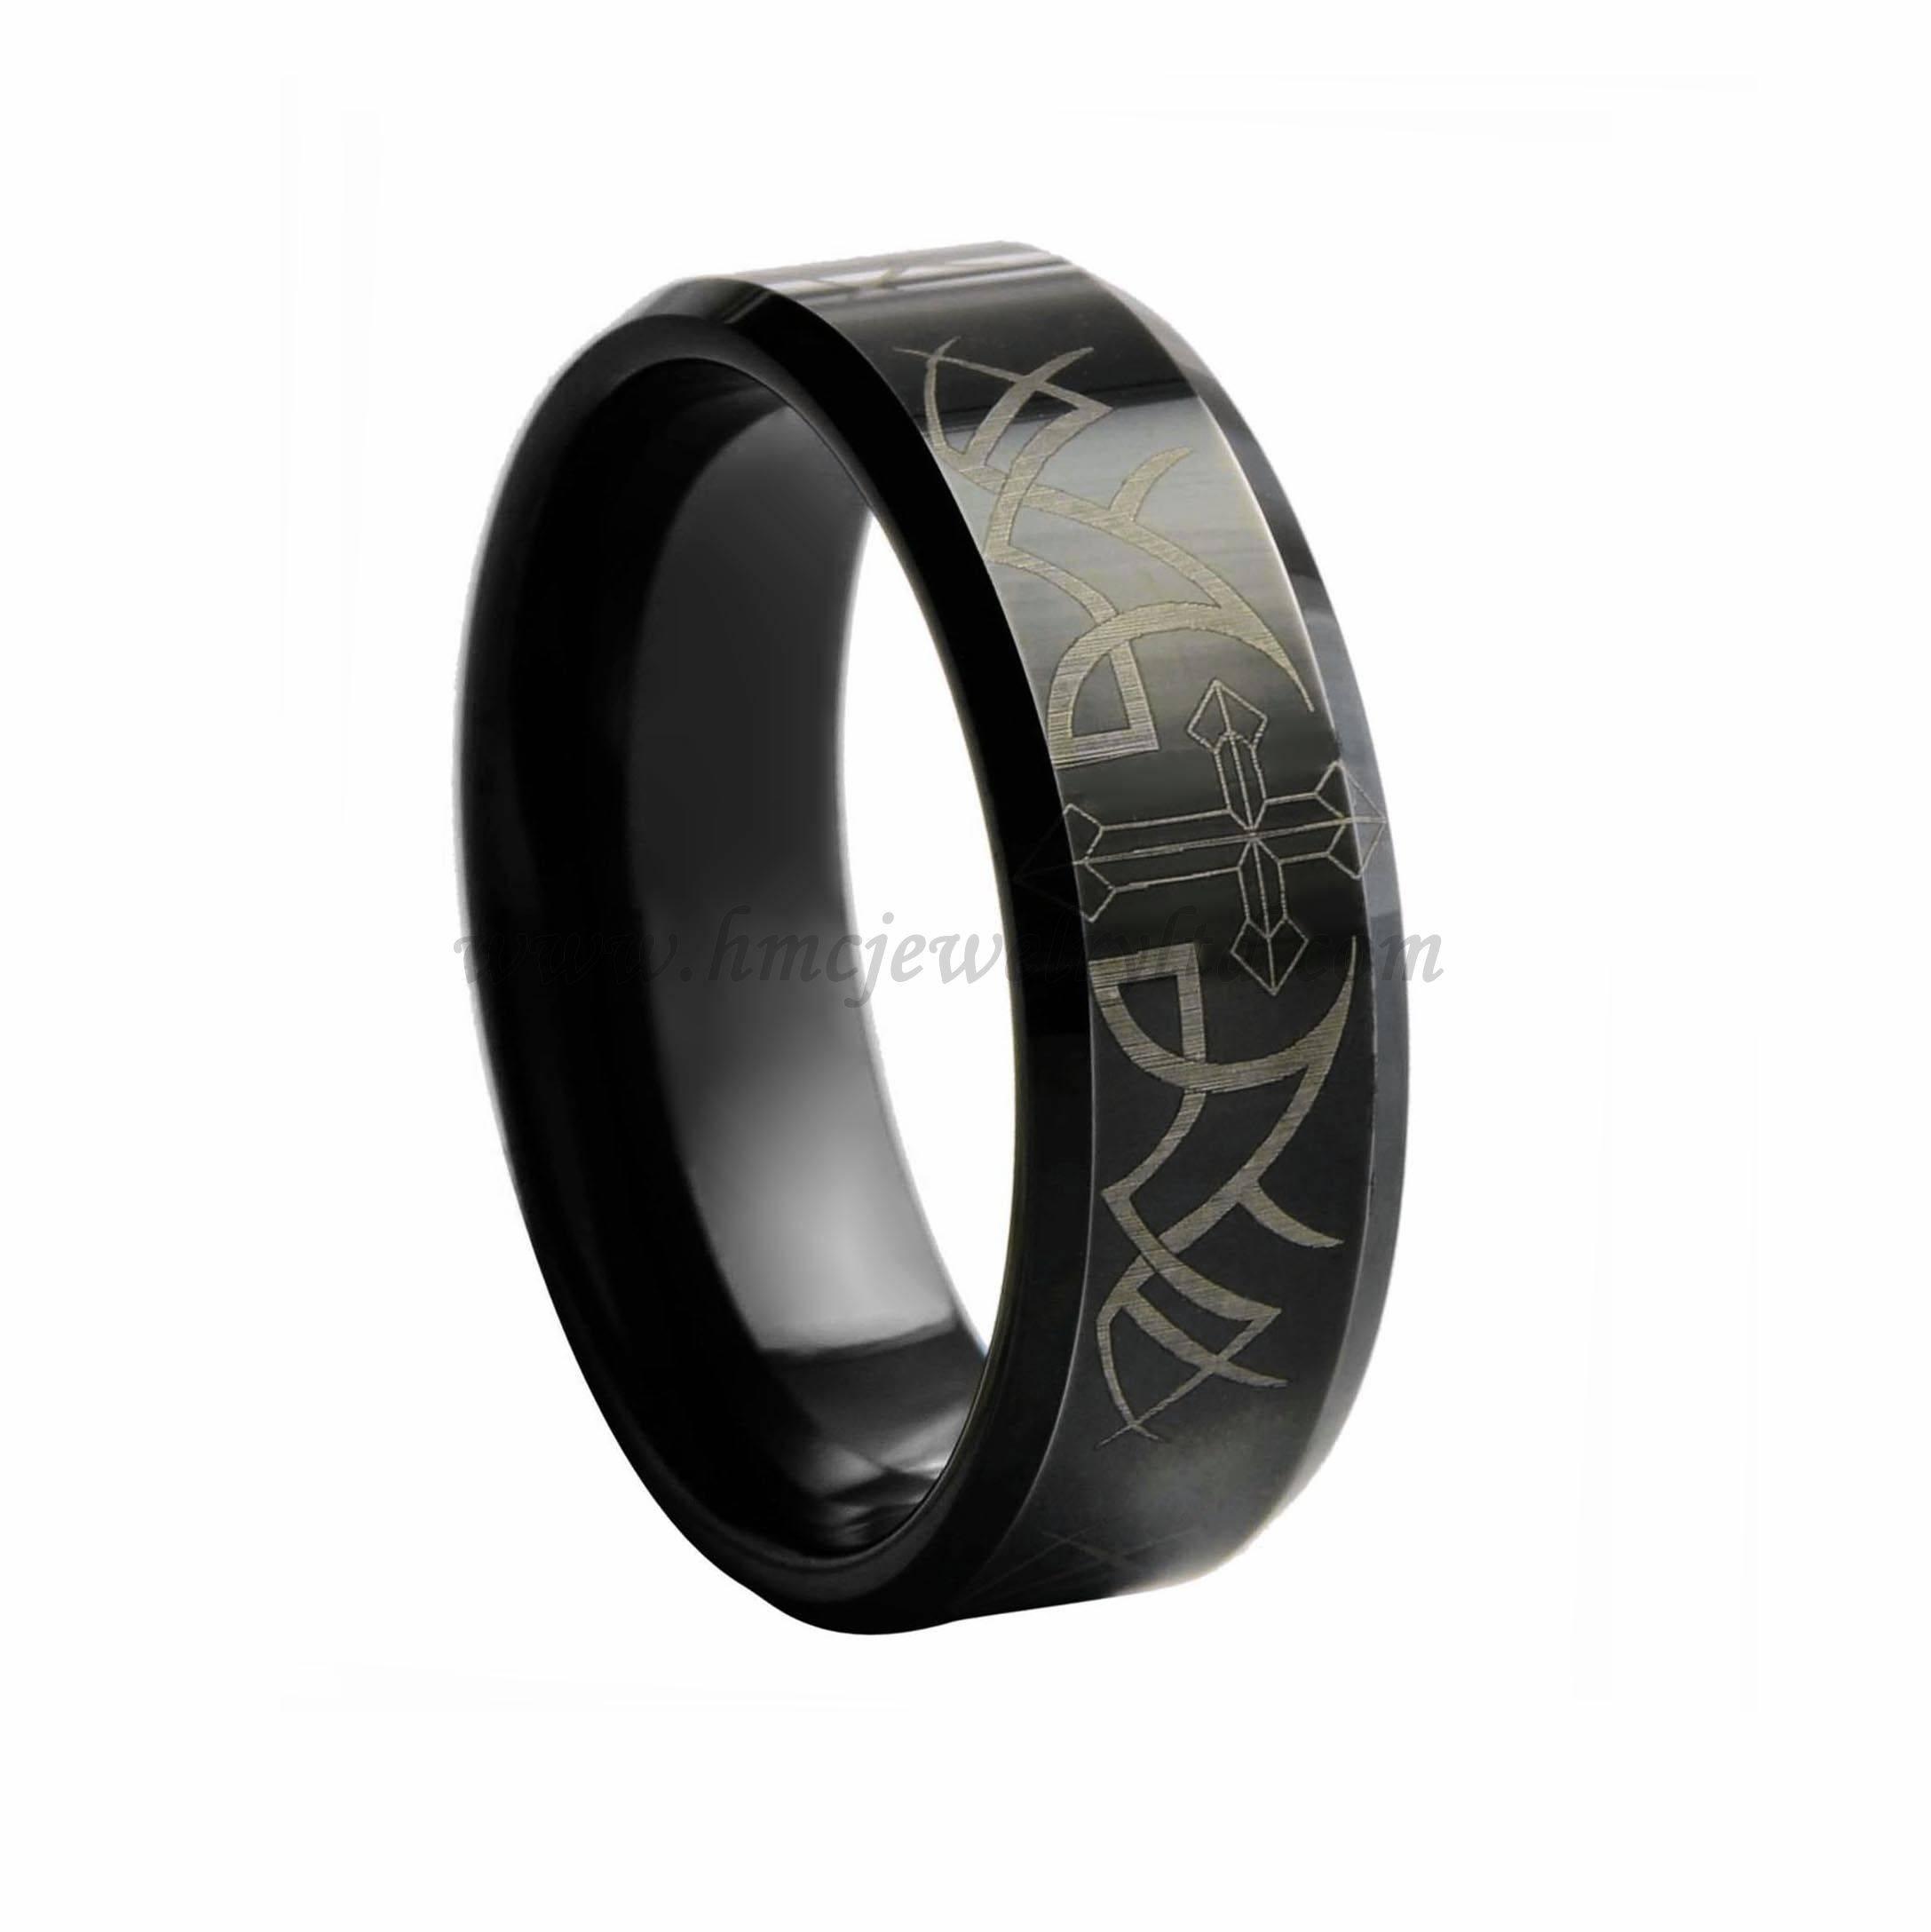 Mens Laser Cross and Thorn Ring Black Tungsten Carbide Ring Jesus Ring